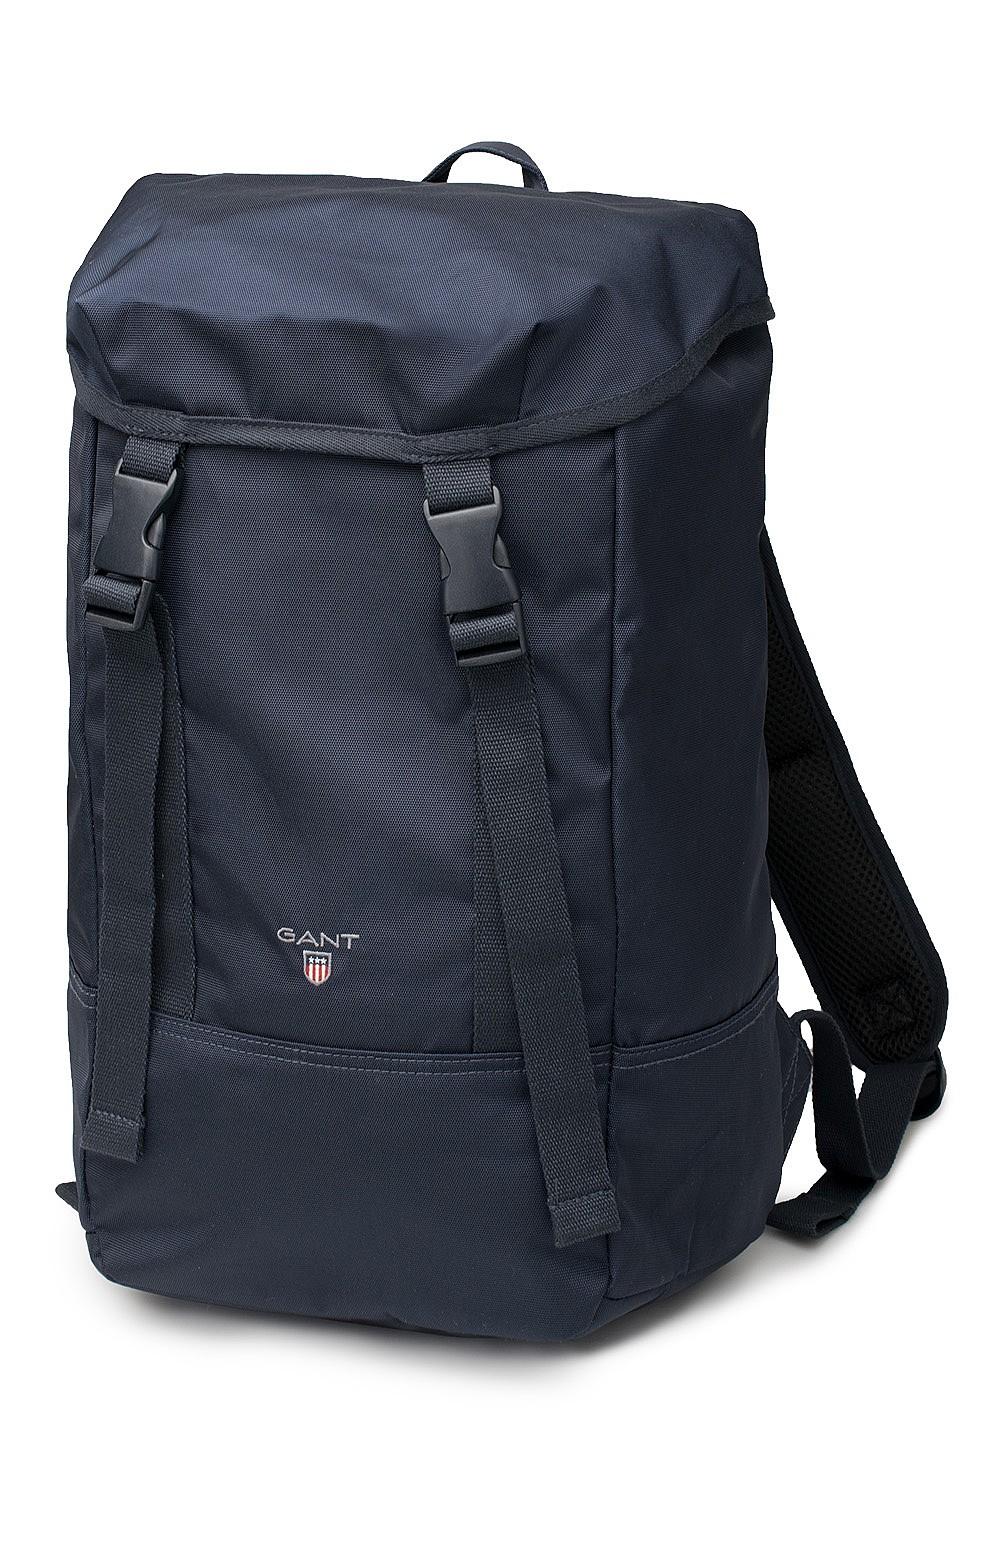 f35bbb542c Gant Original Backpack - House of Bruar